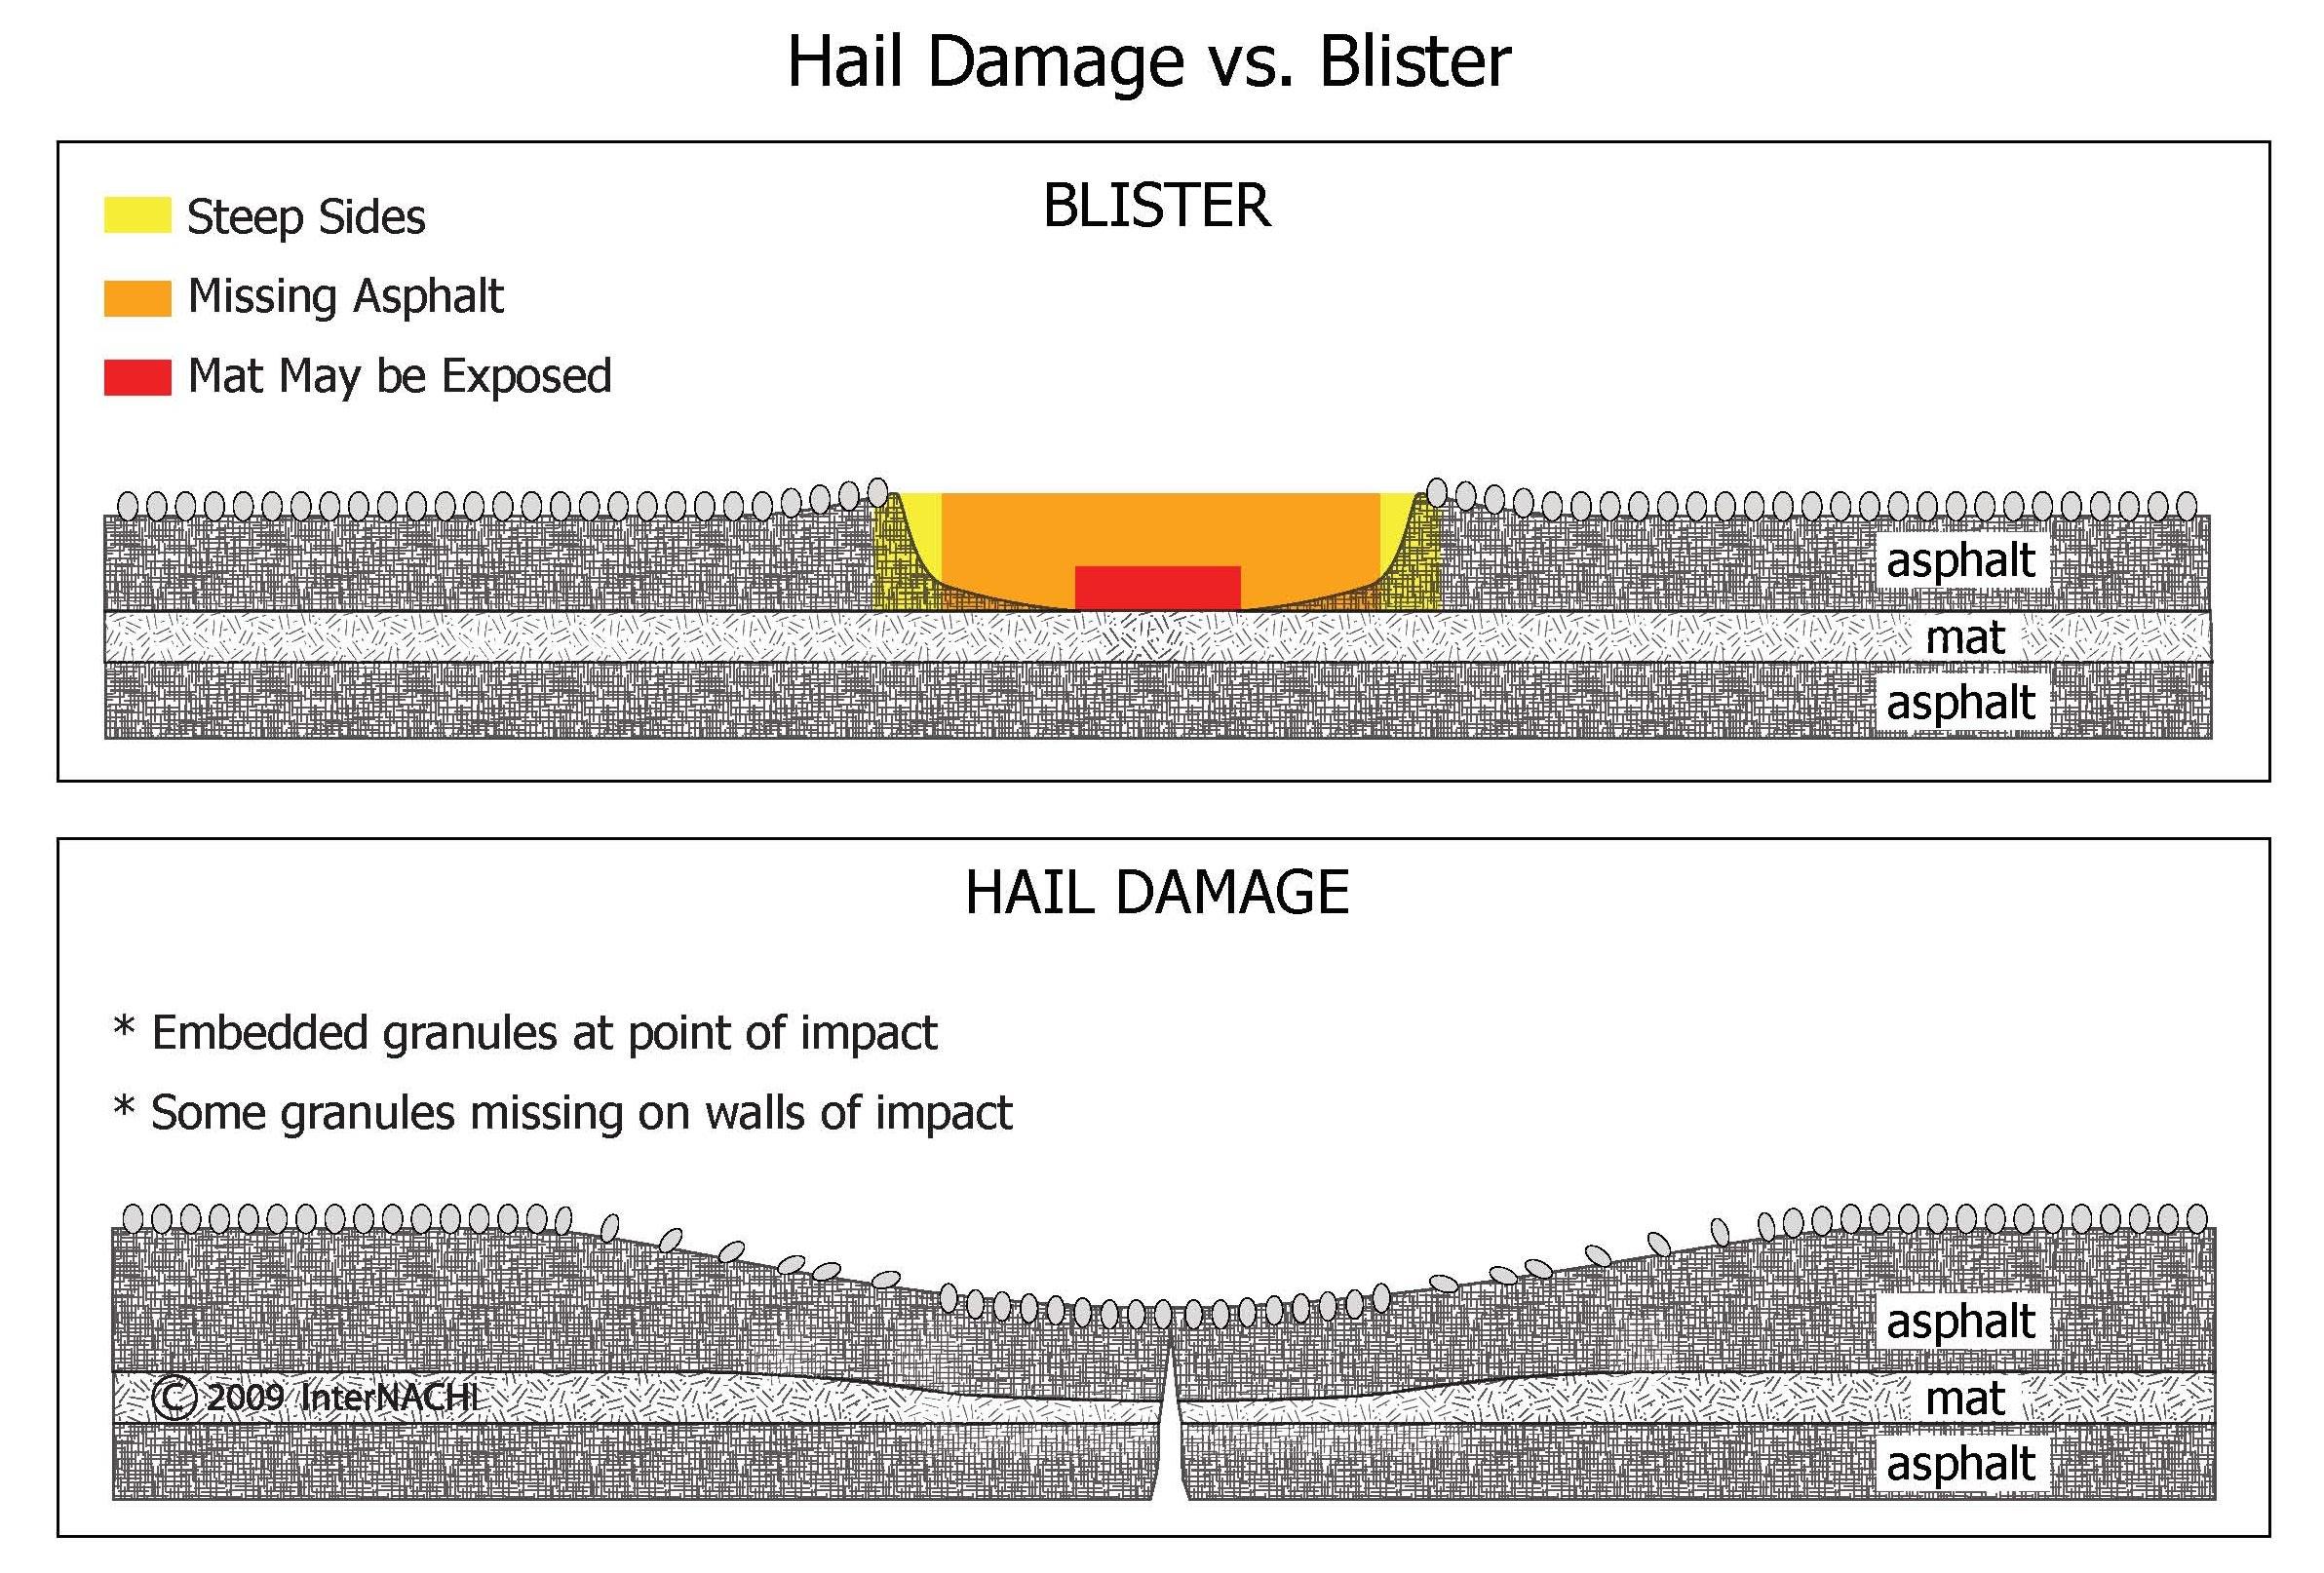 Hail damage vs. blister.